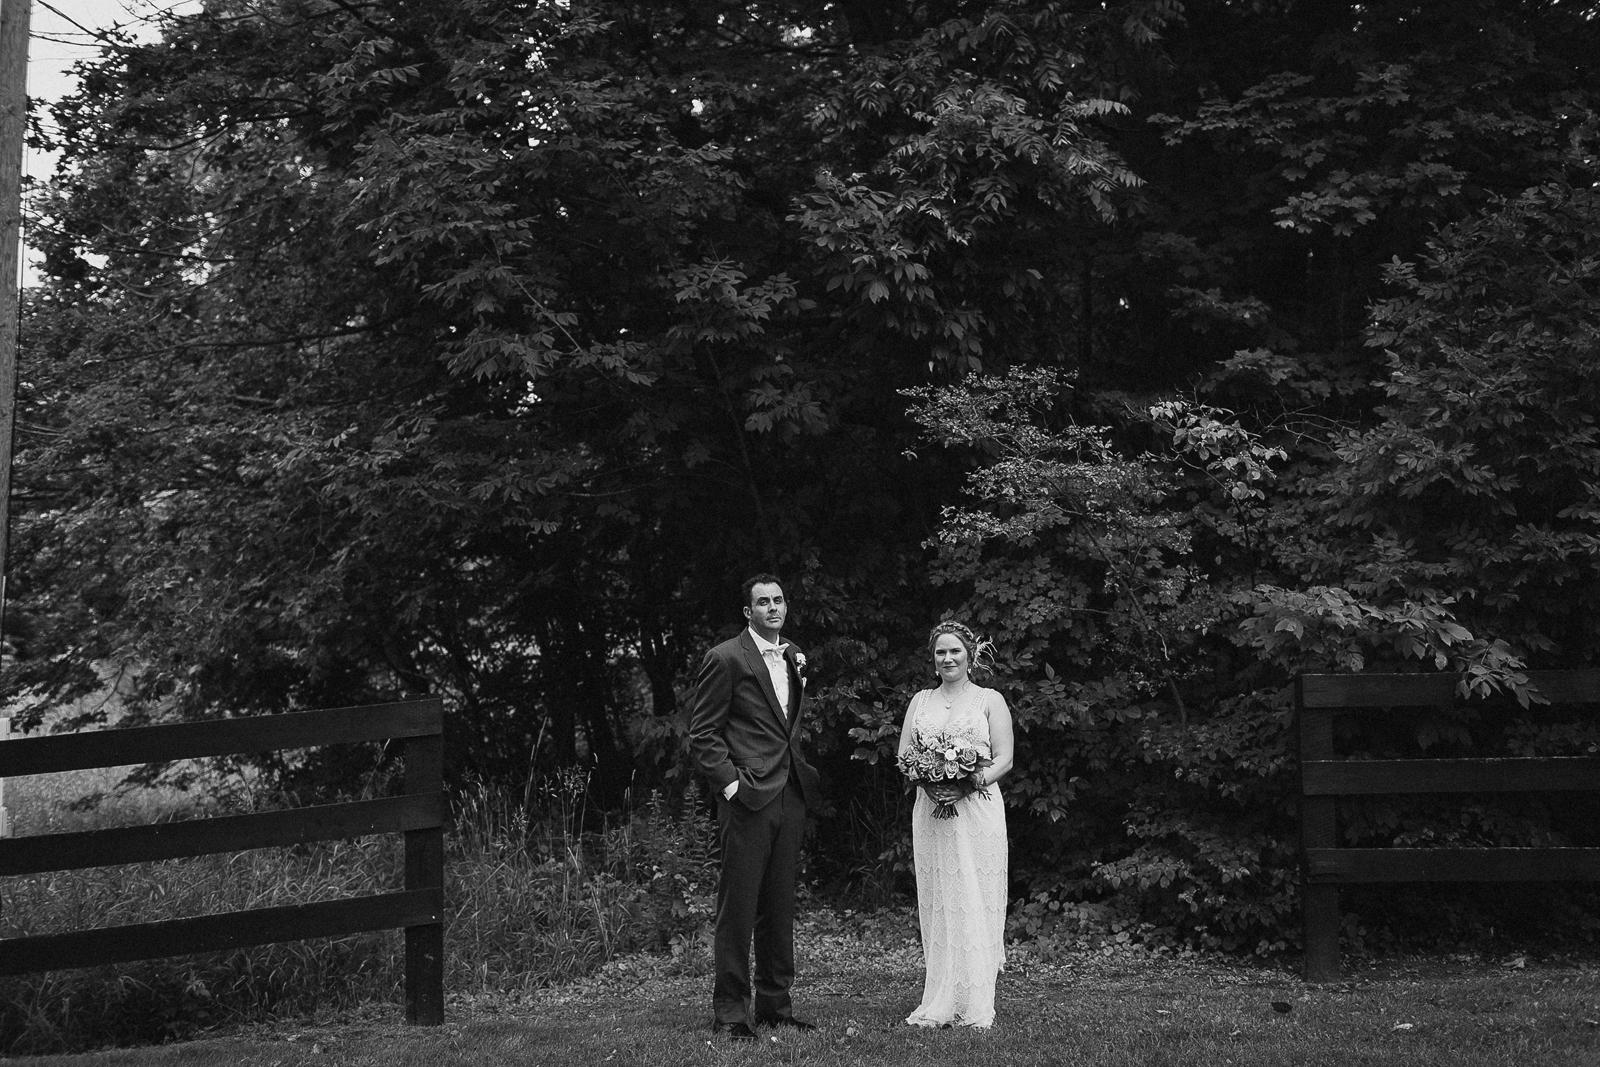 mike-and-jenni-wedding-079.jpg